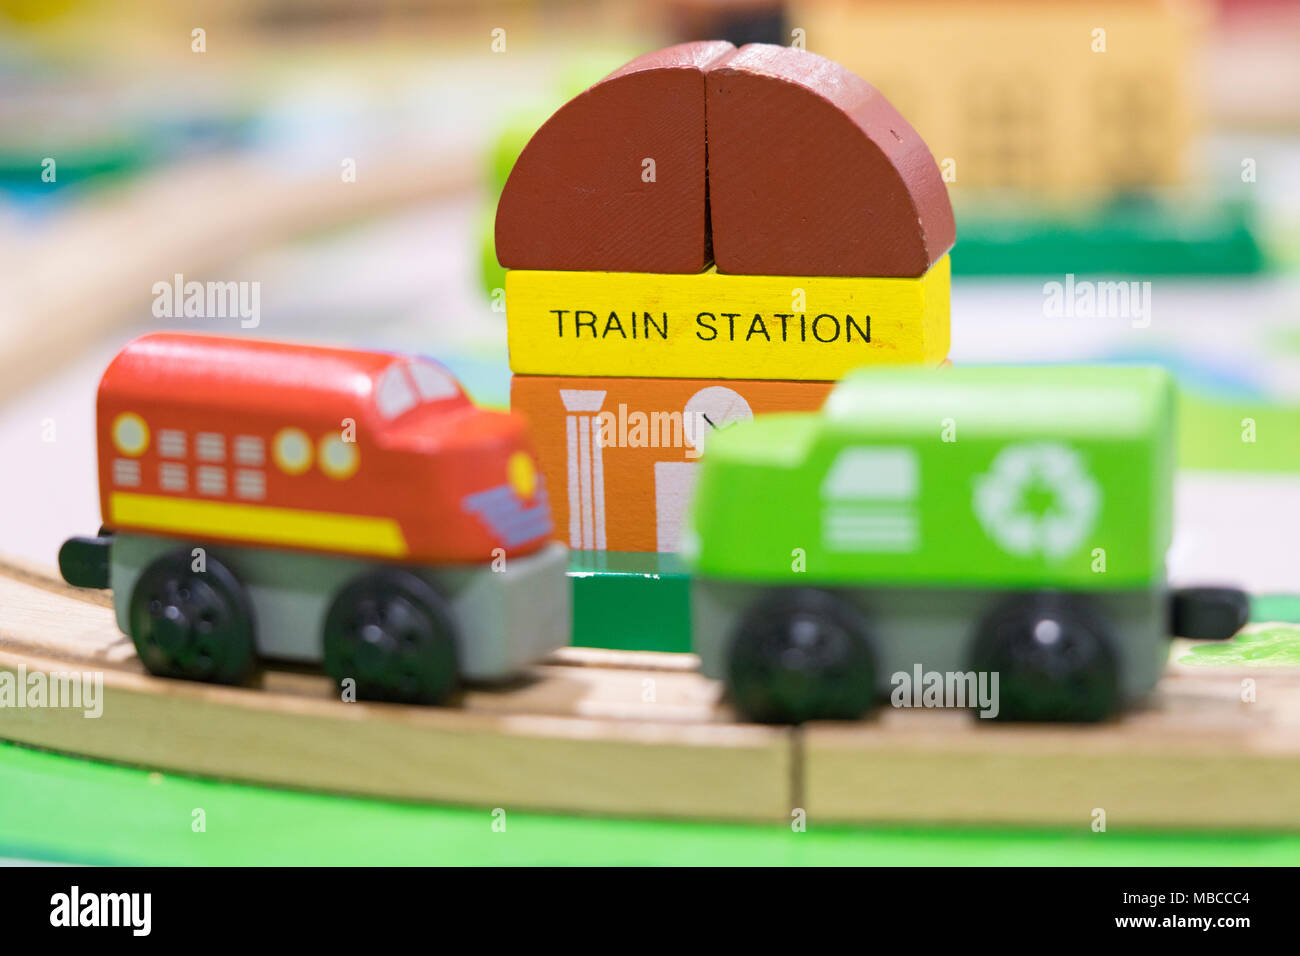 Estación Tren Telón Trenes De El Juguete En Con Madera P8kwon0x Dos kiZuOXTP